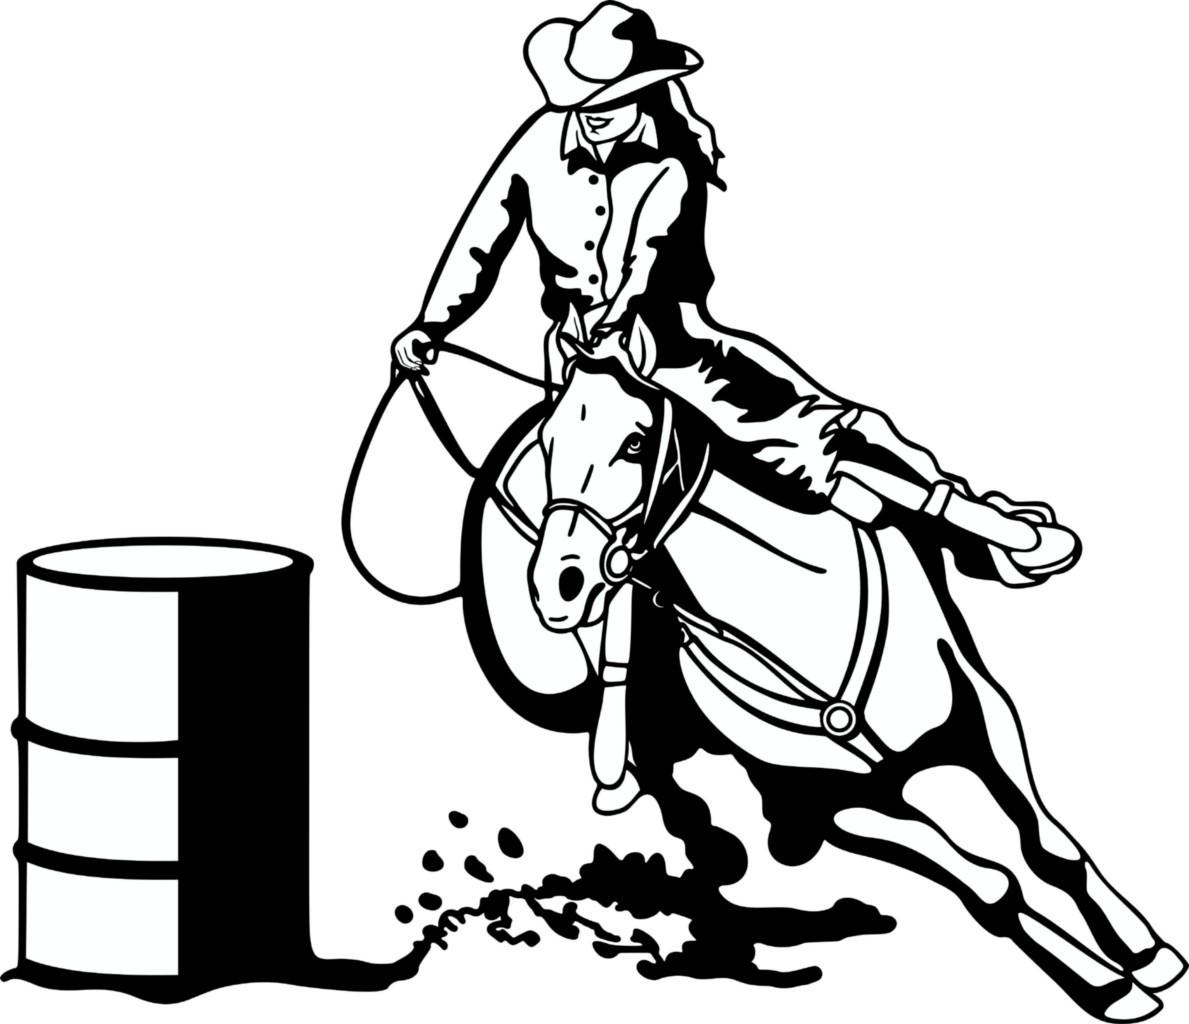 Free Barrel Racing Horse Clipart Image